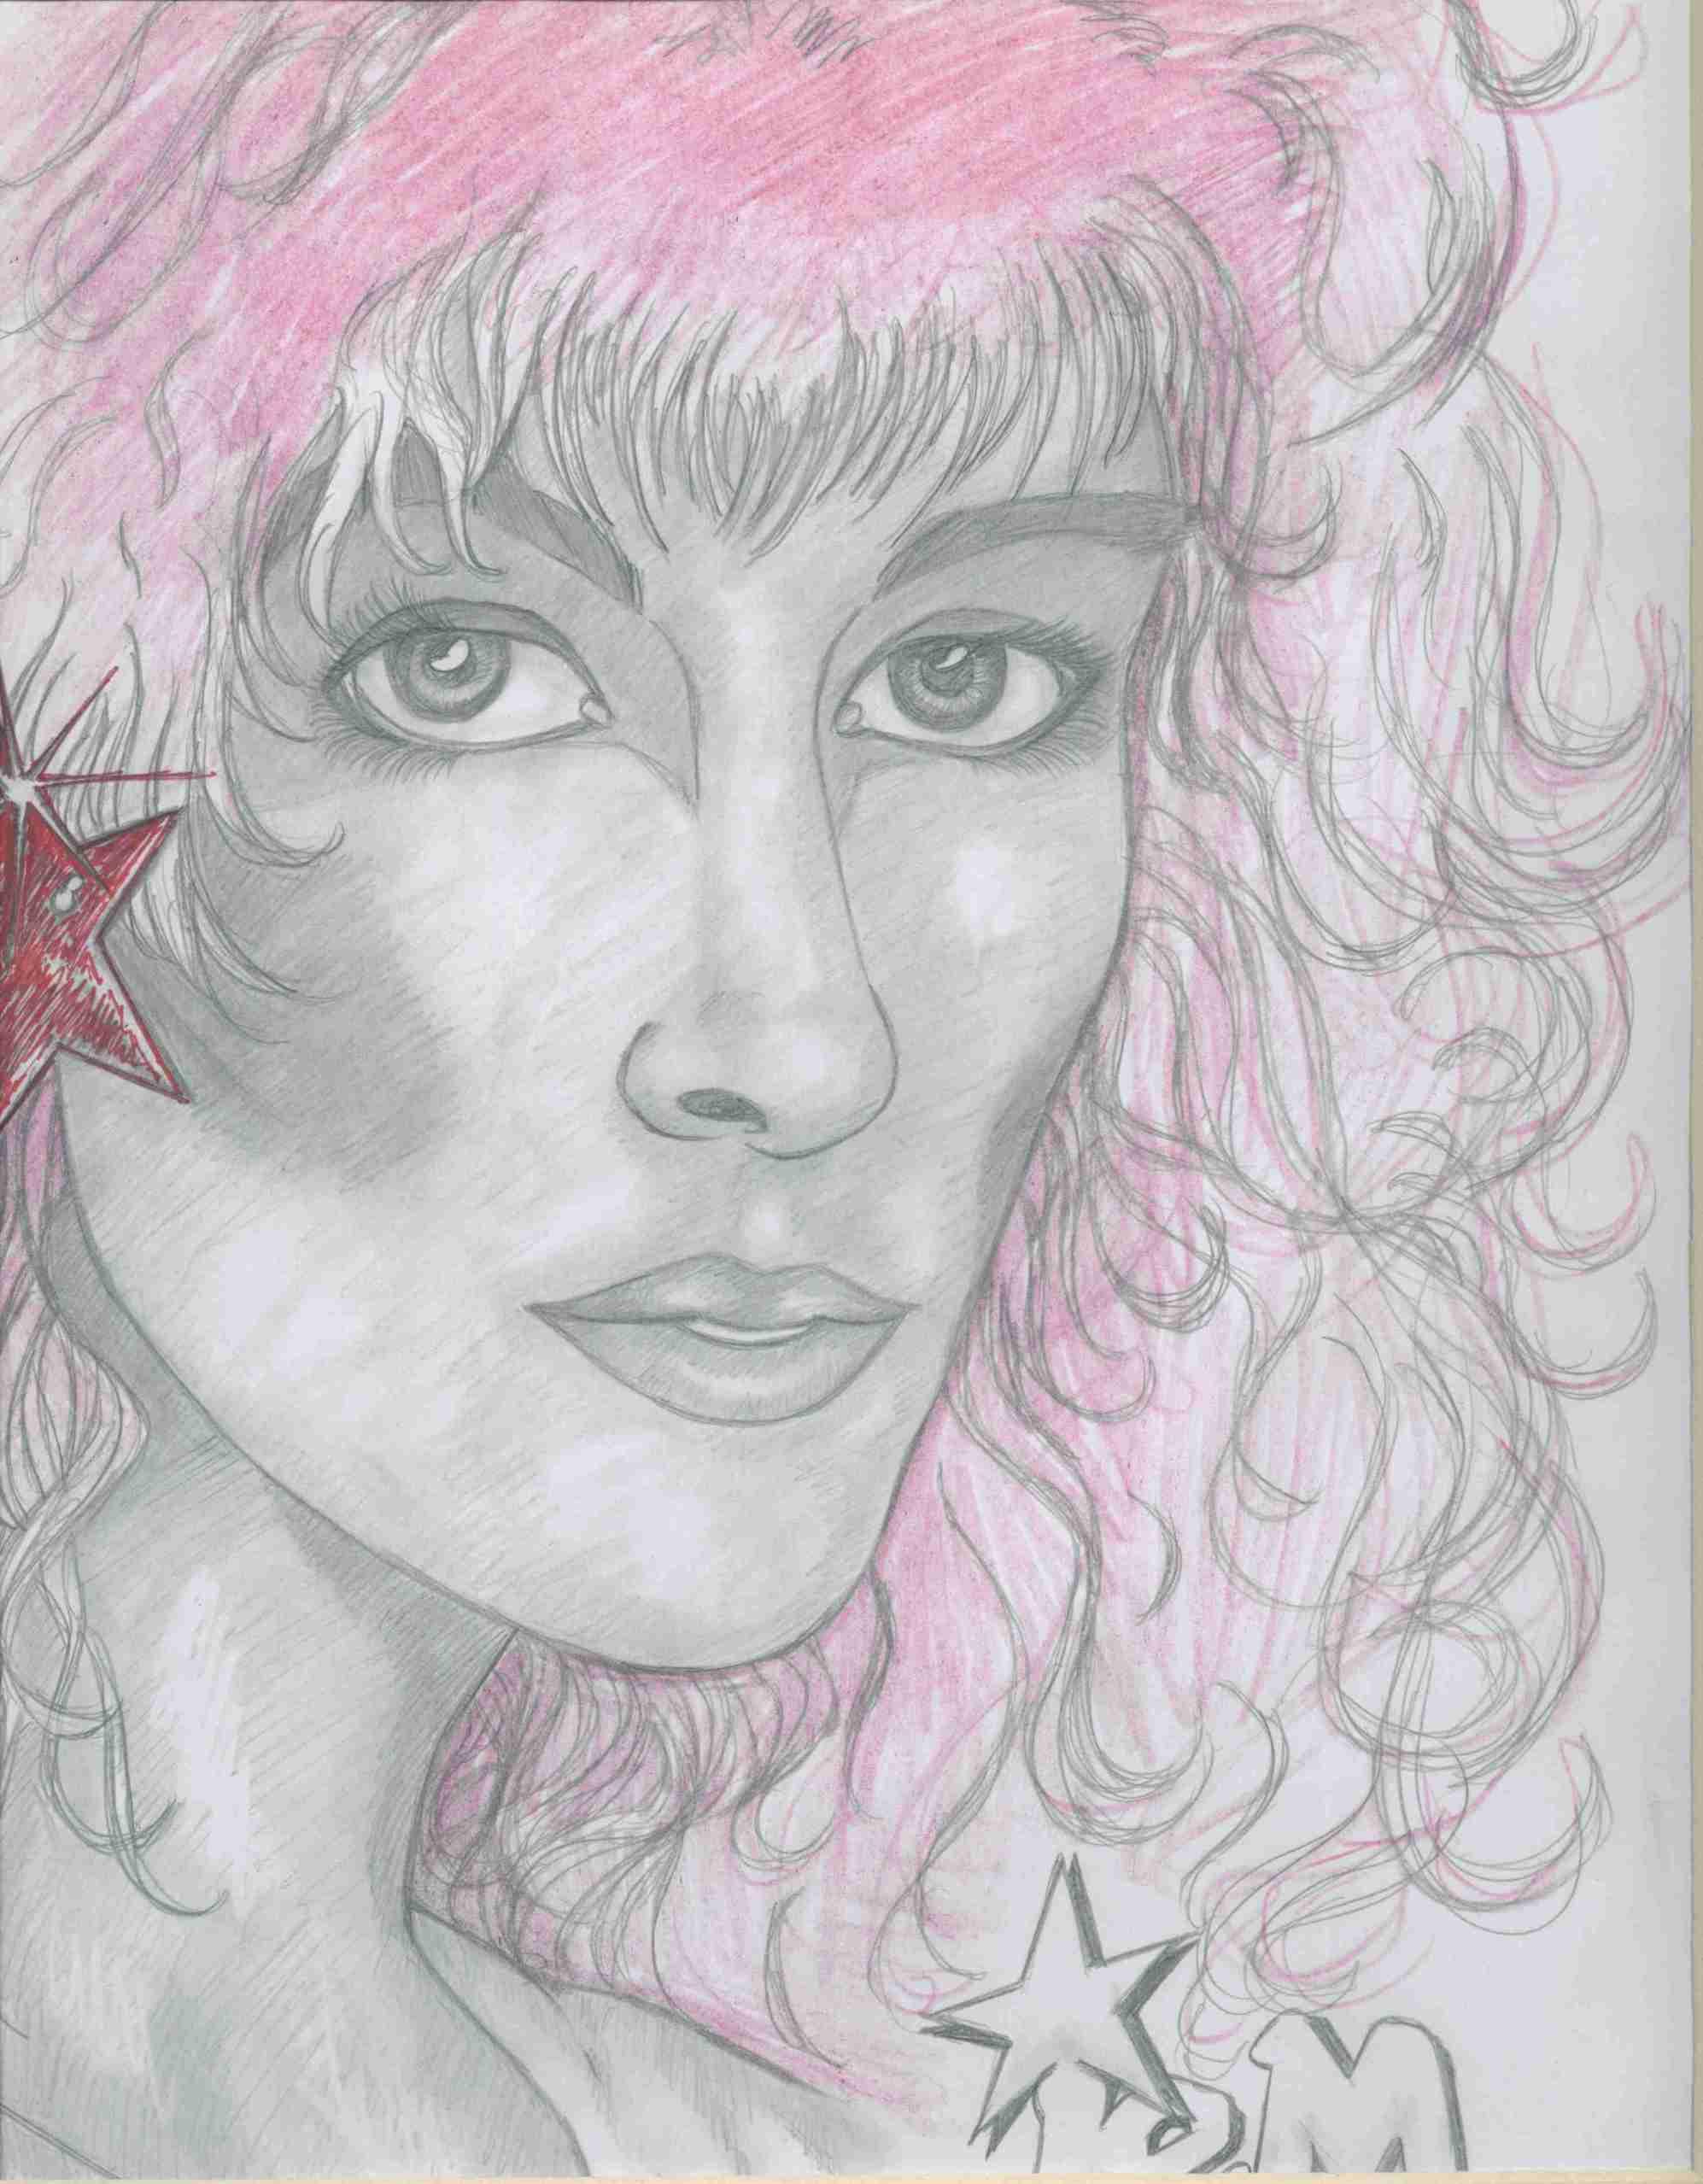 Artwork by Elaine Rodriguez